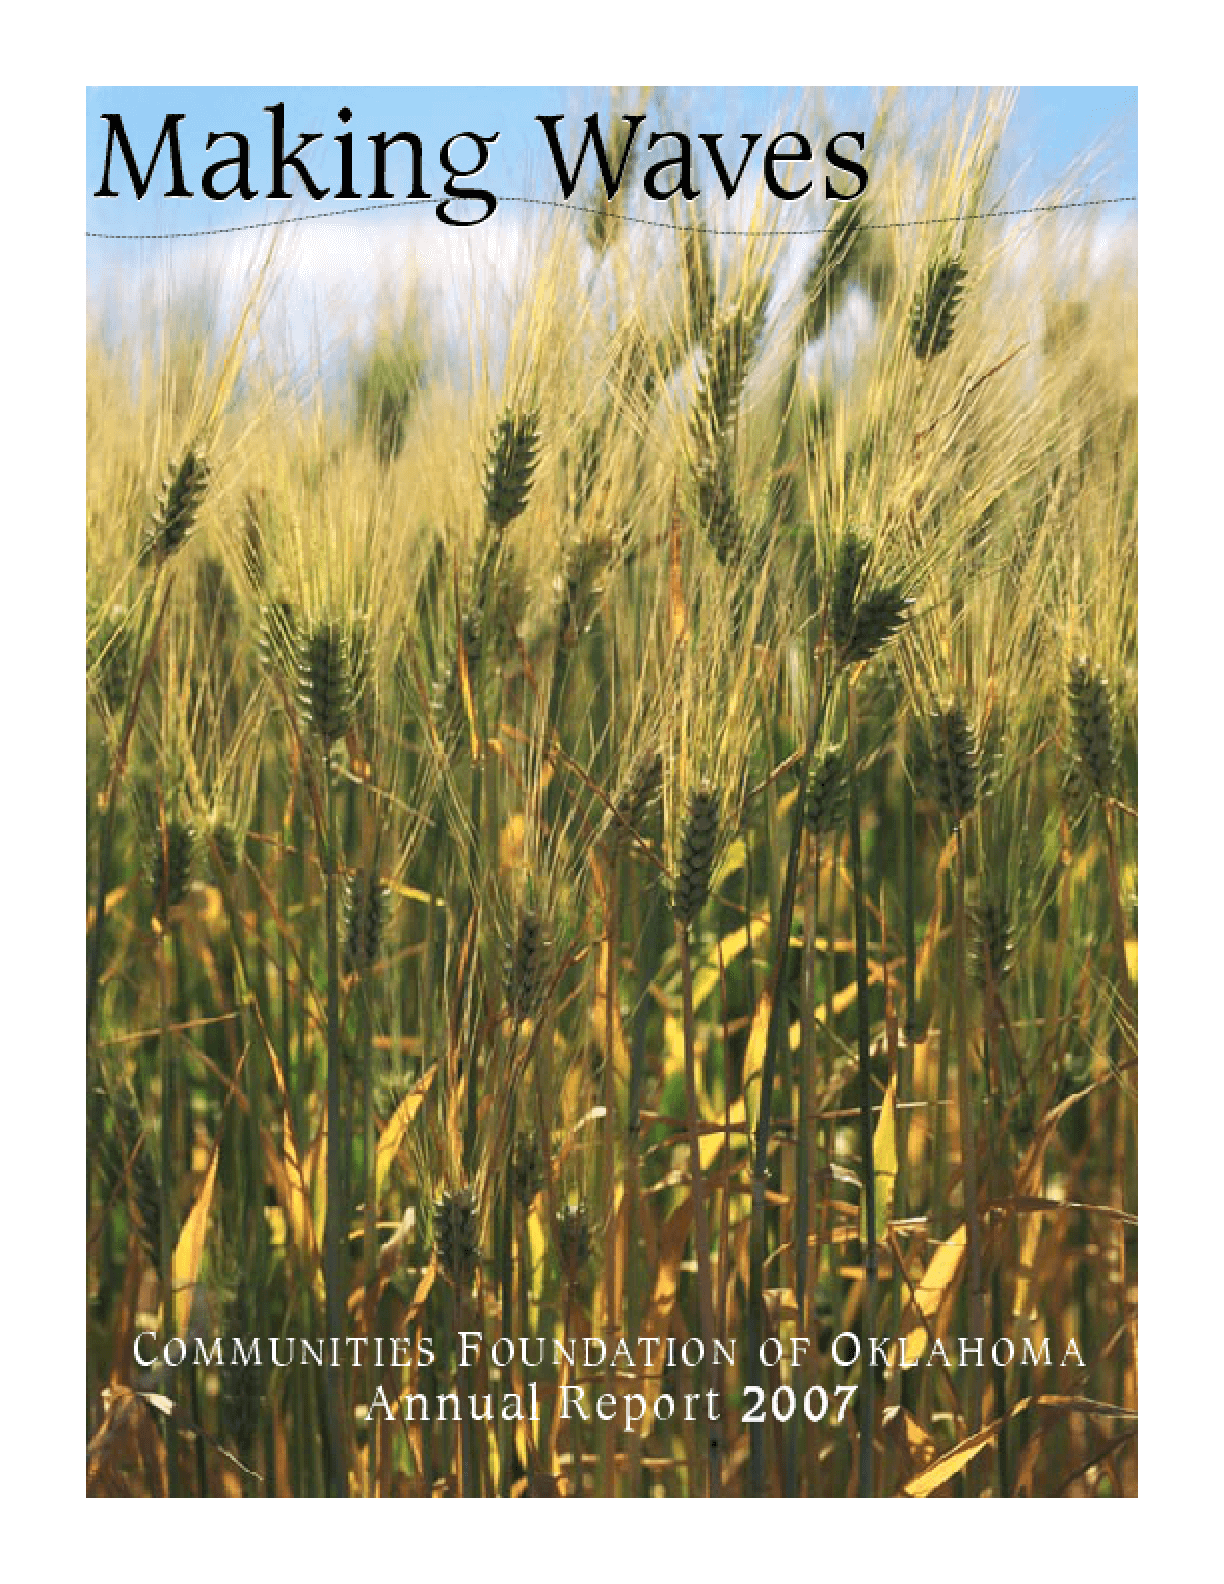 Communities Foundation of Oklahoma - 2007 Annual Report